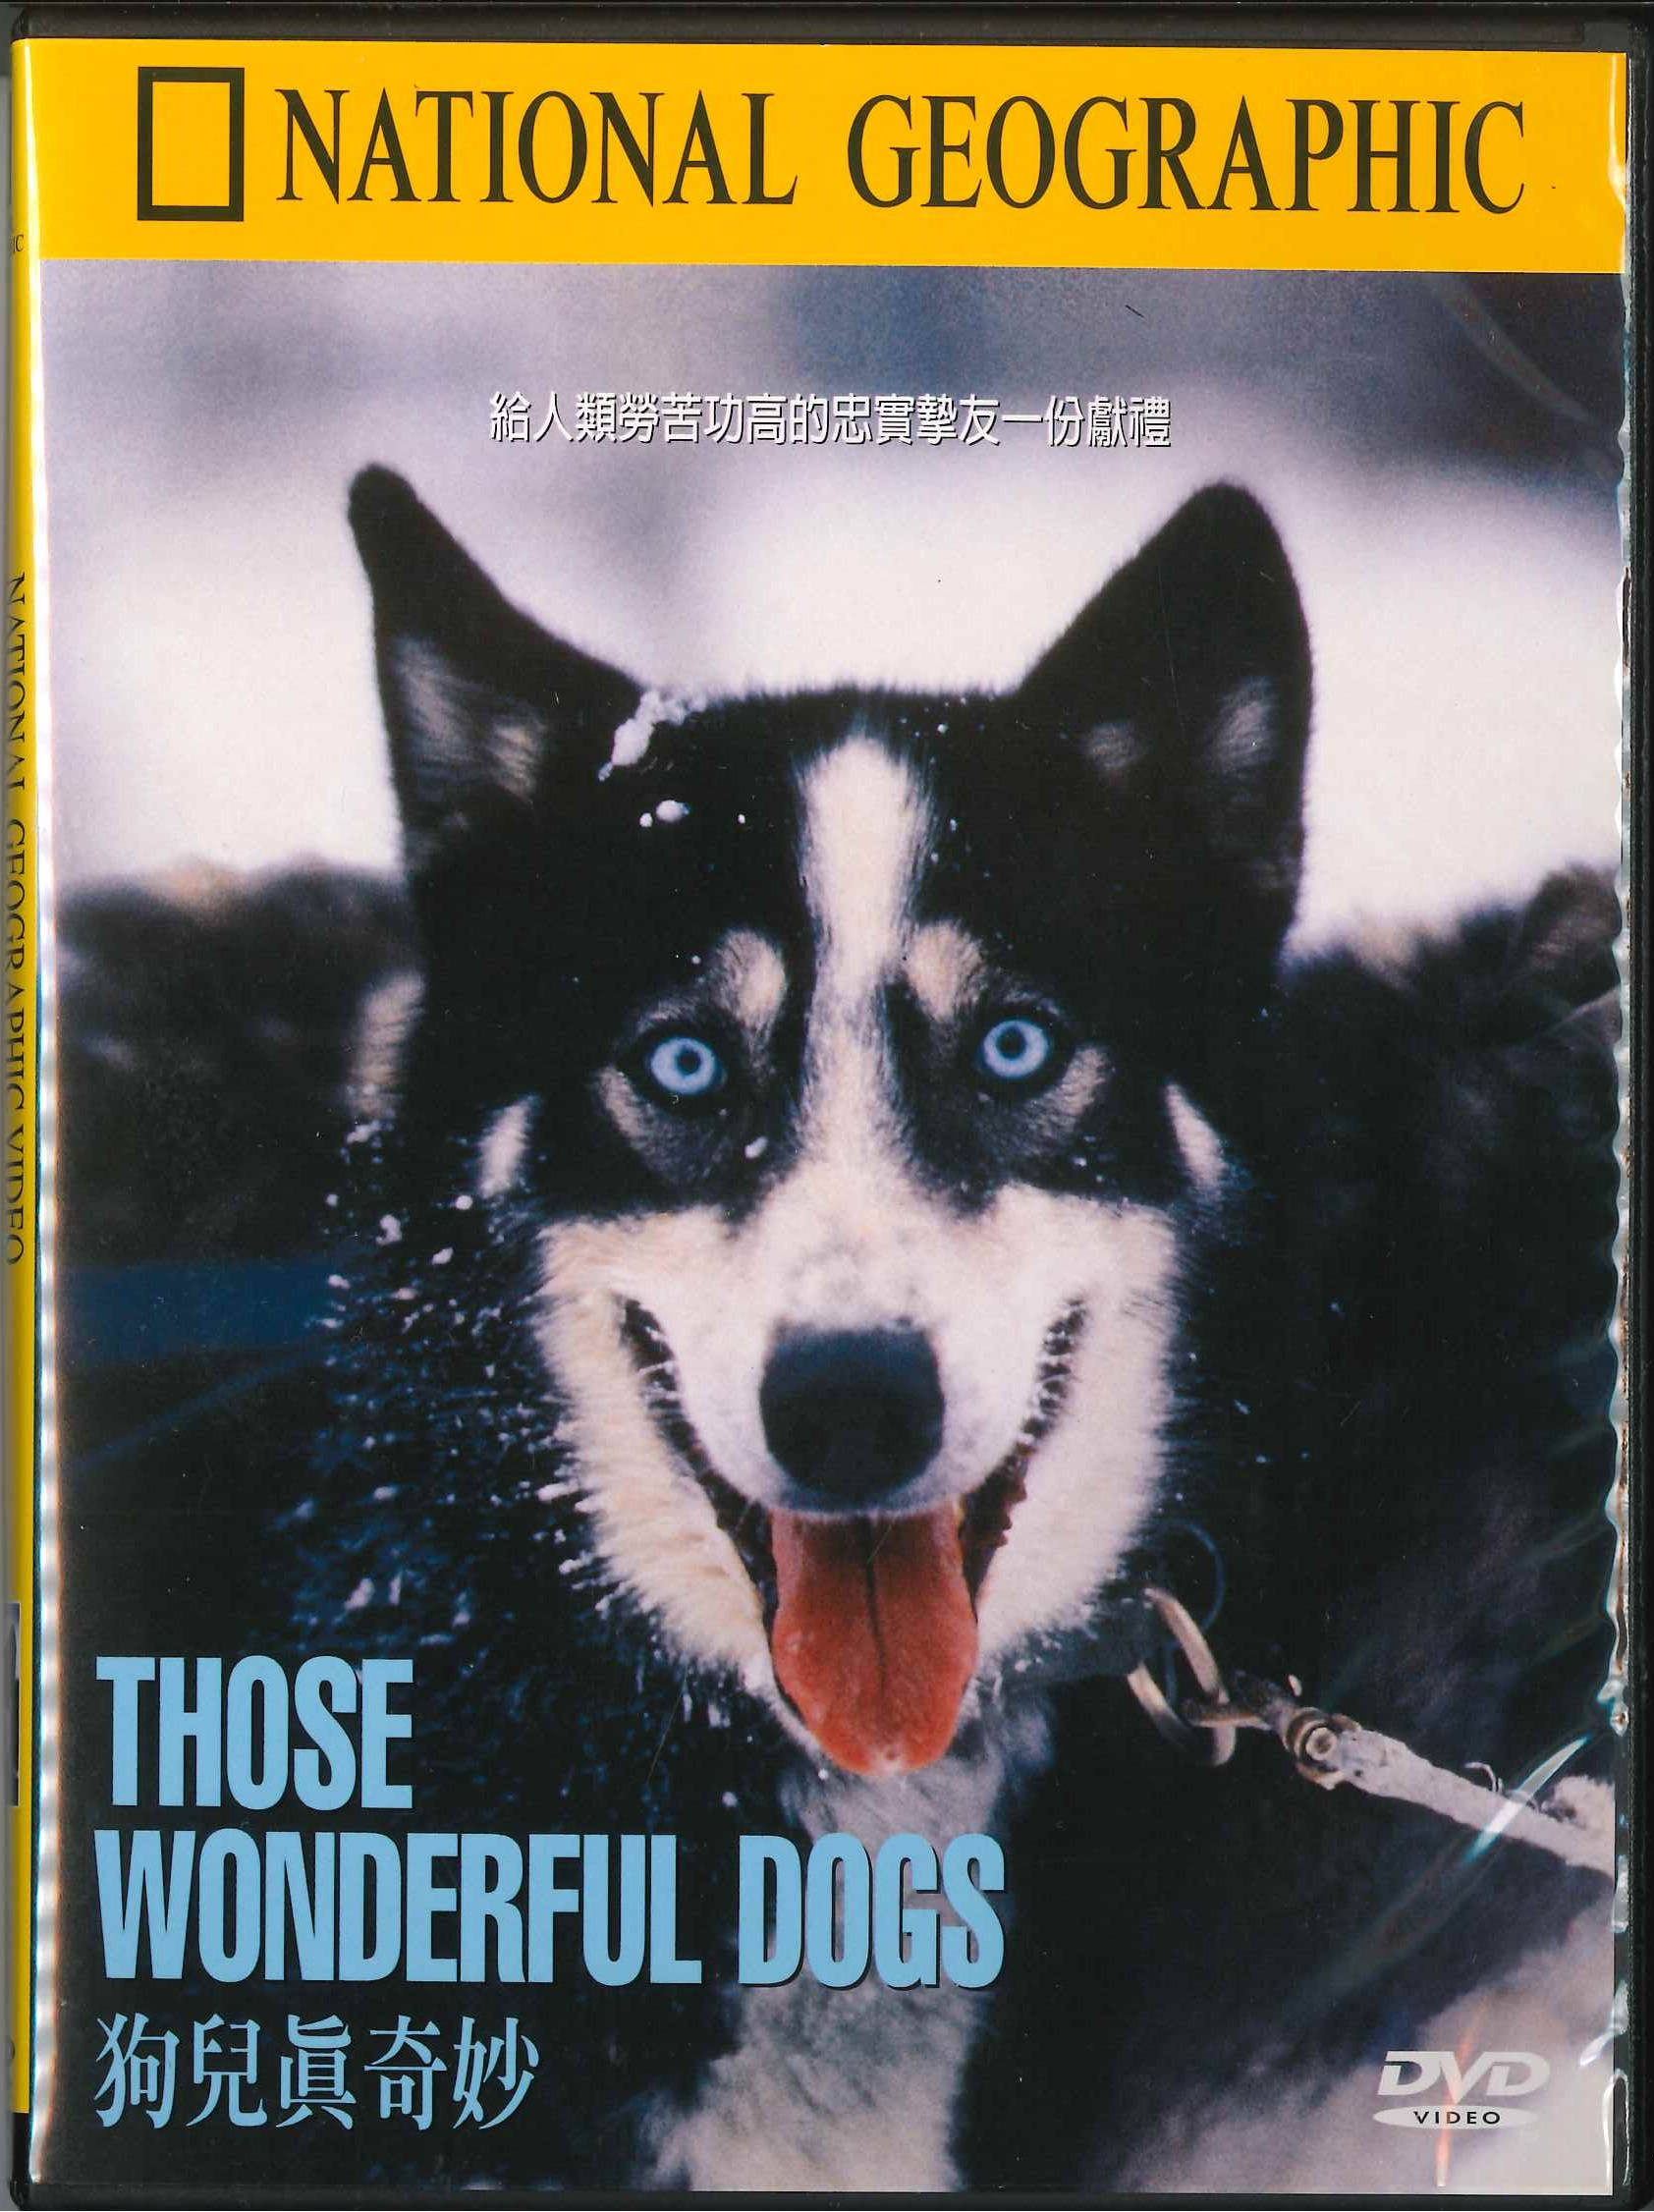 狗兒真奇妙 [錄影資料]=Those wonderful dogs